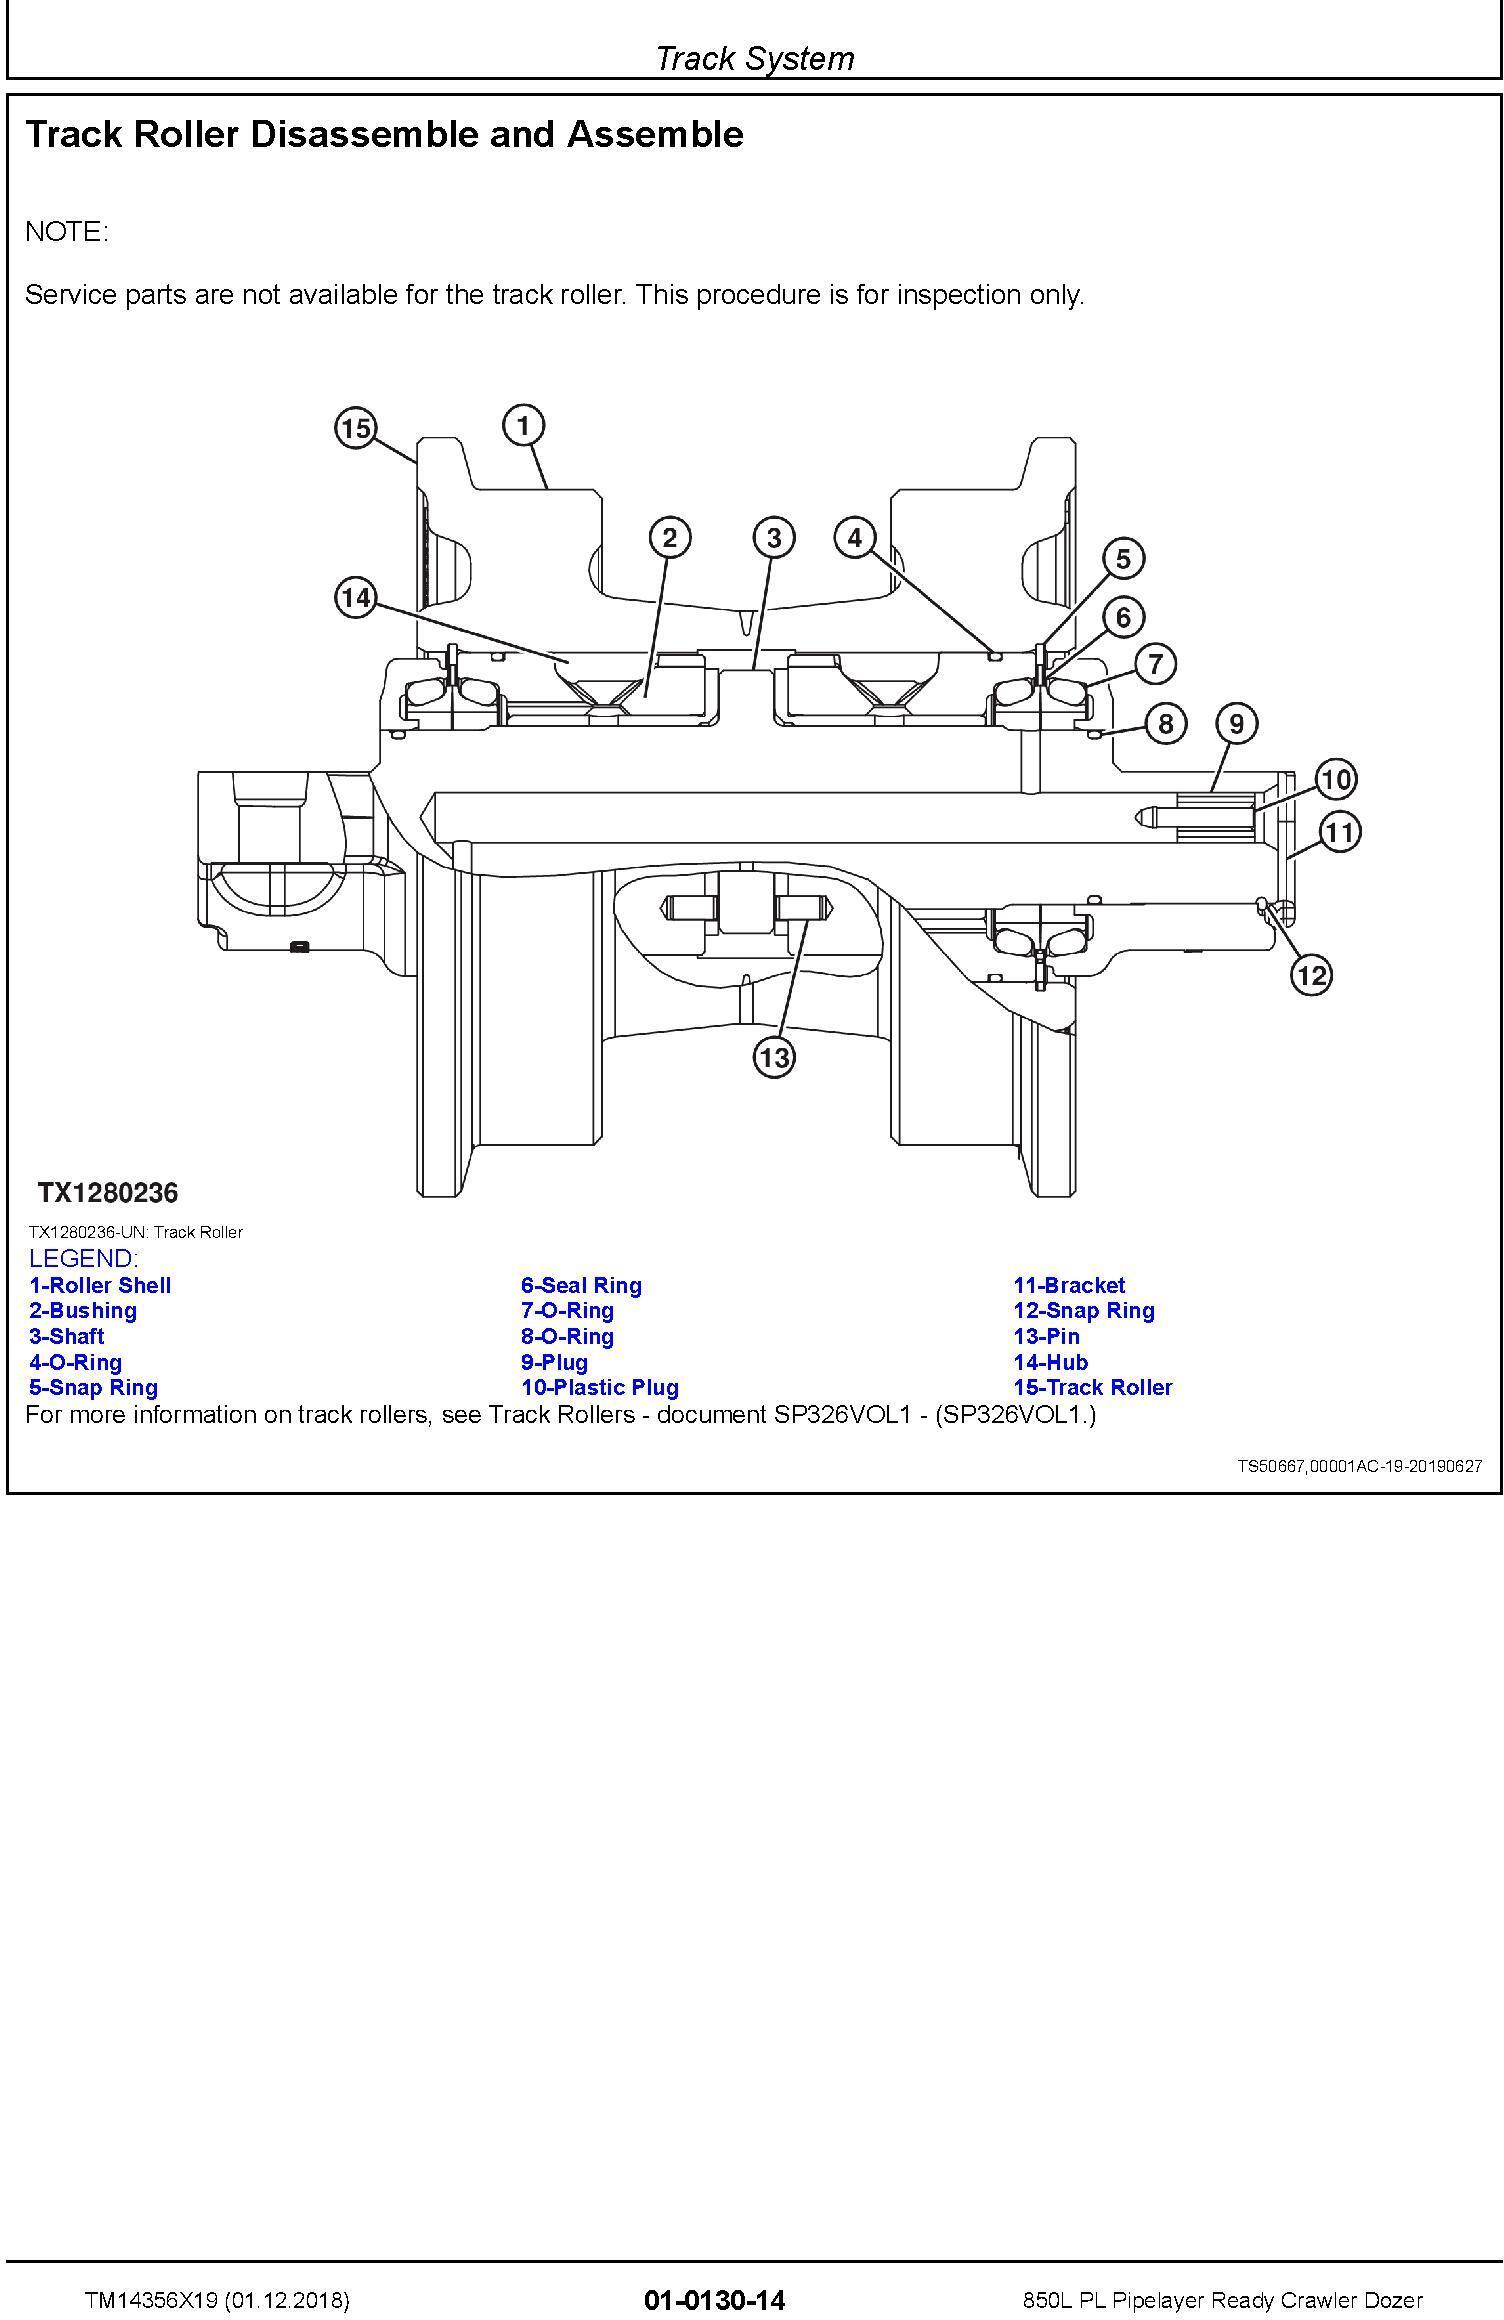 John Deere 850L PL Pipelayer Ready Crawler Dozer Repair Technical Manual (TM14356X19) - 2